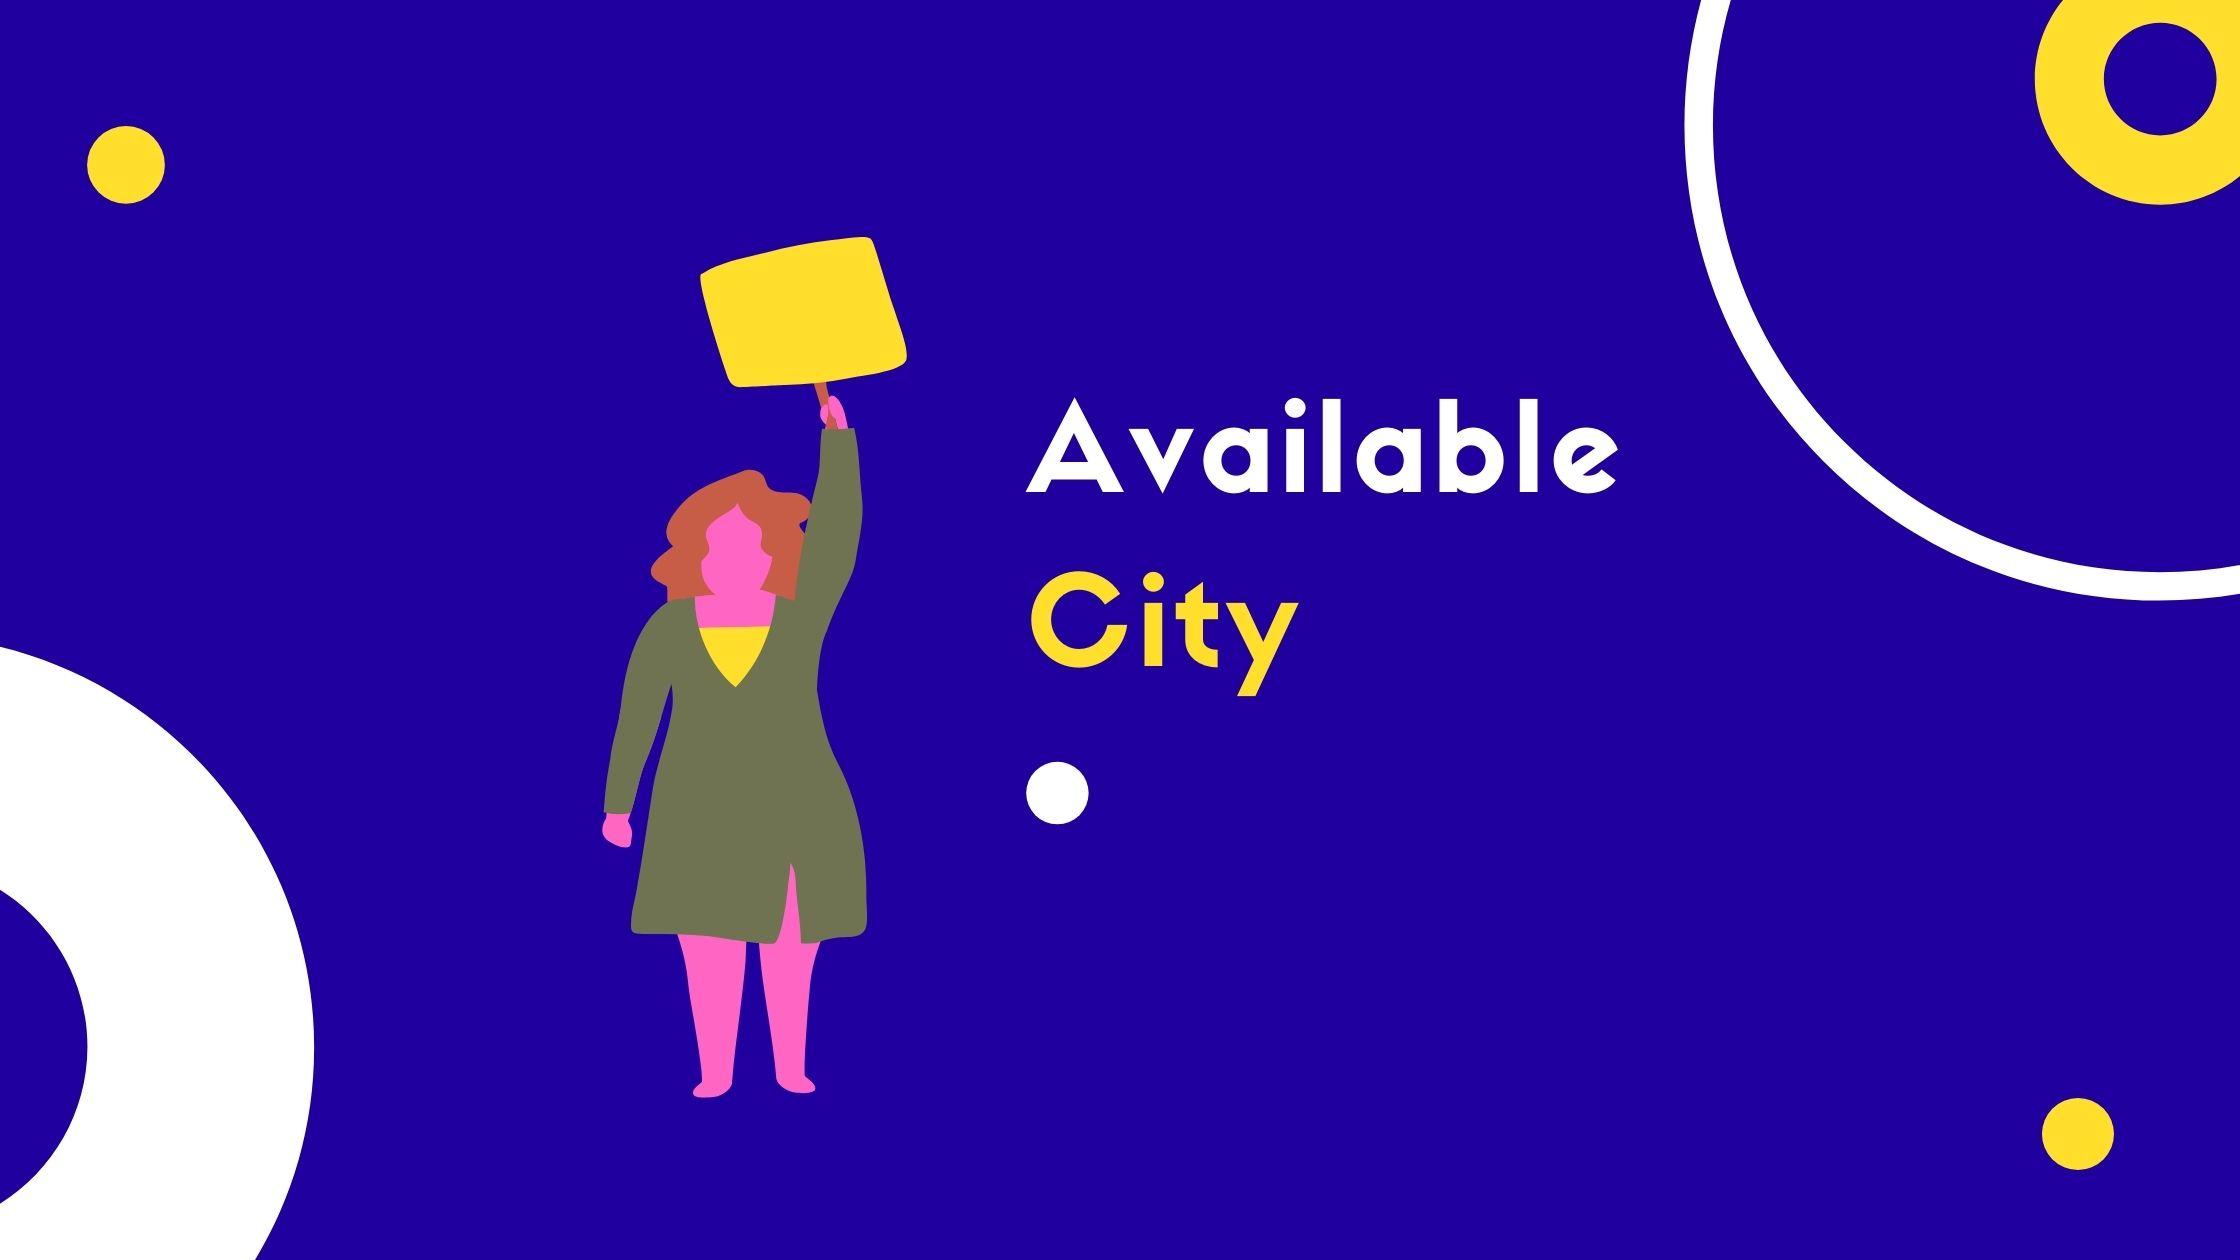 Available City - Health portal